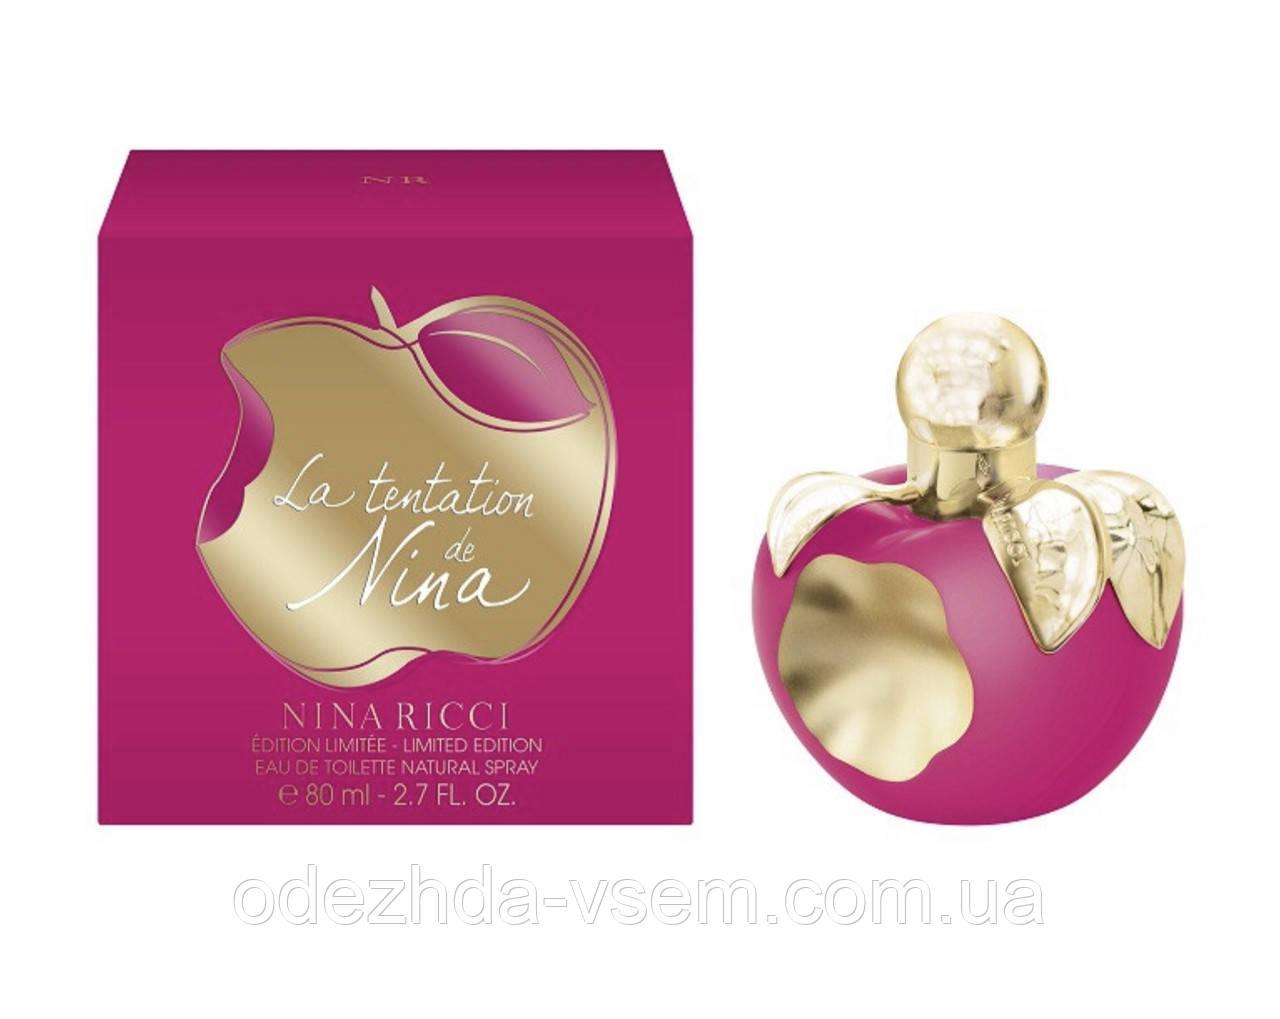 Жіноча туалетна вода Nina Ricci La Tentation de Nina (Яскраво-рожева упаковка)80ml